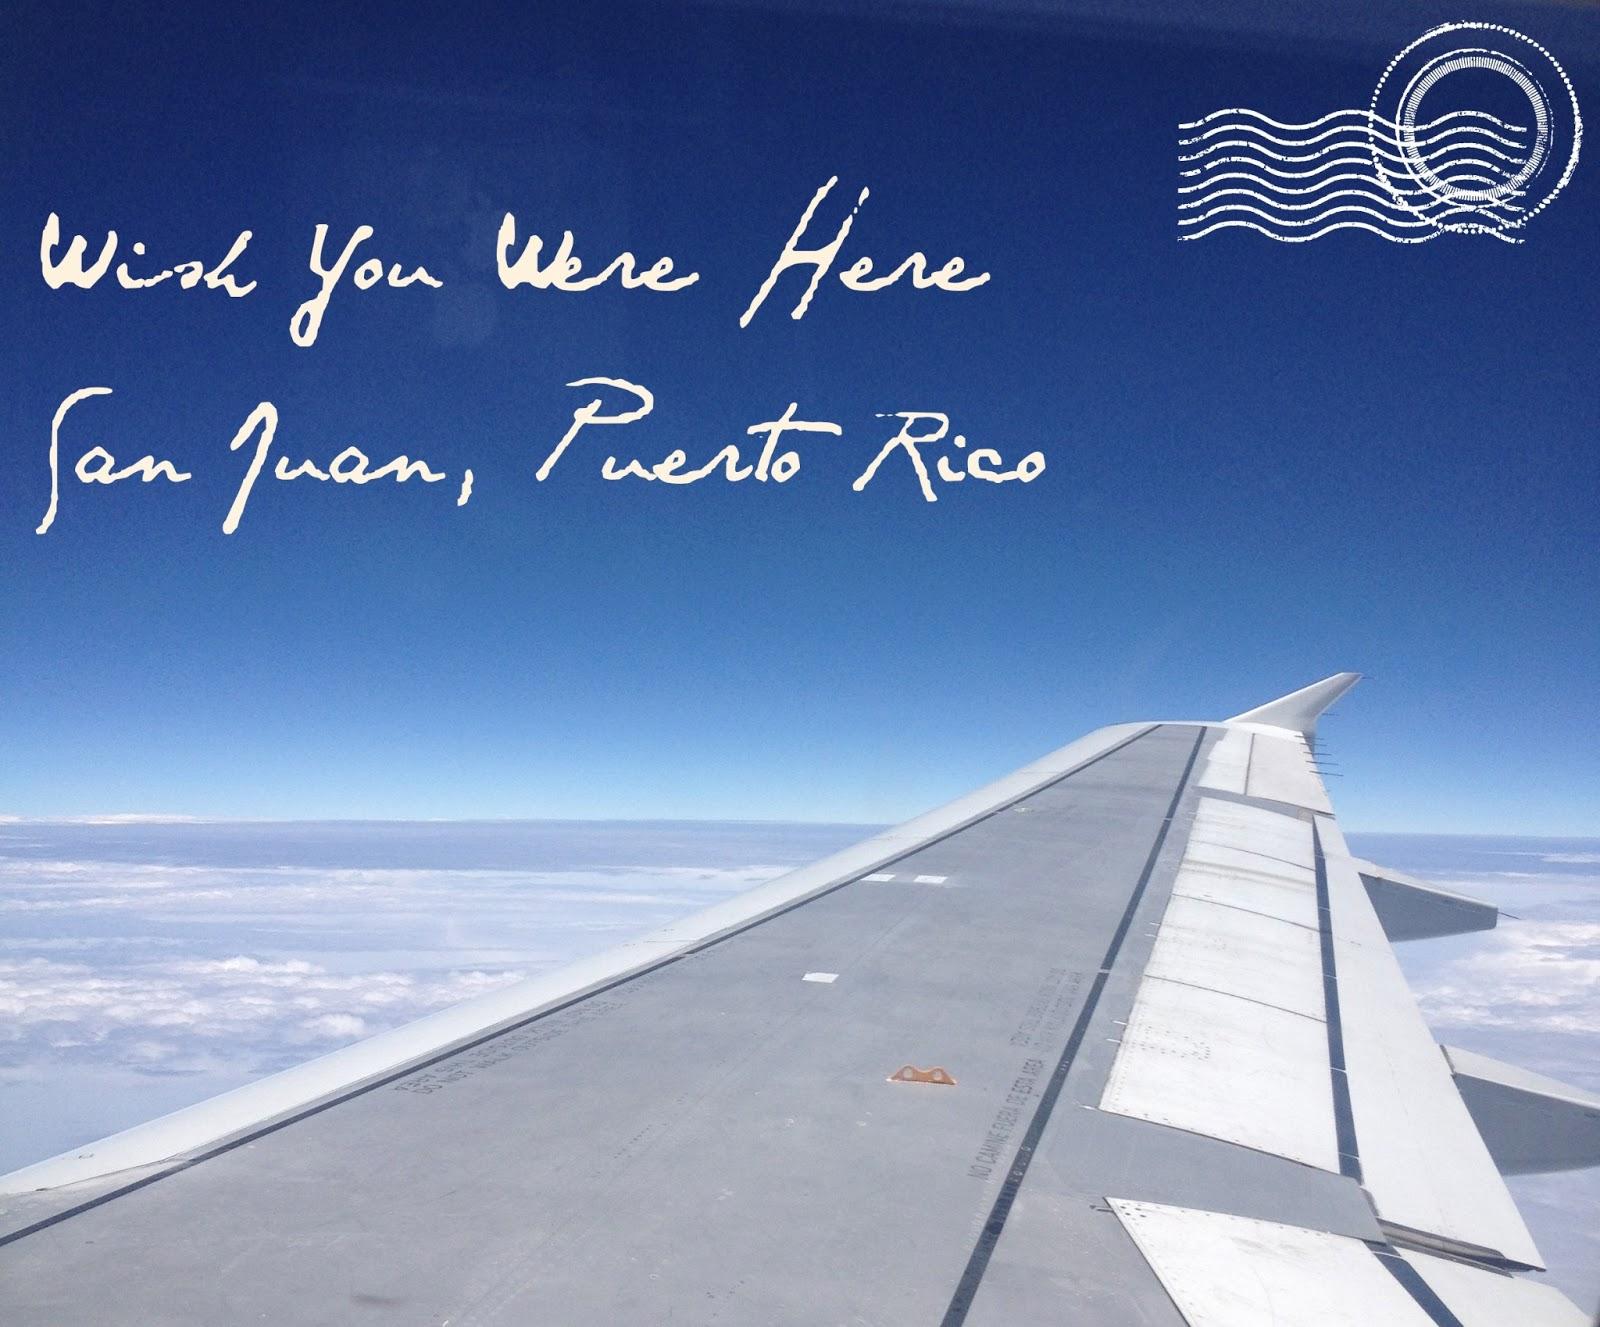 Wish You Were Here Quotes Best Jordan Wish You Were Here  San Juan Puerto Rico